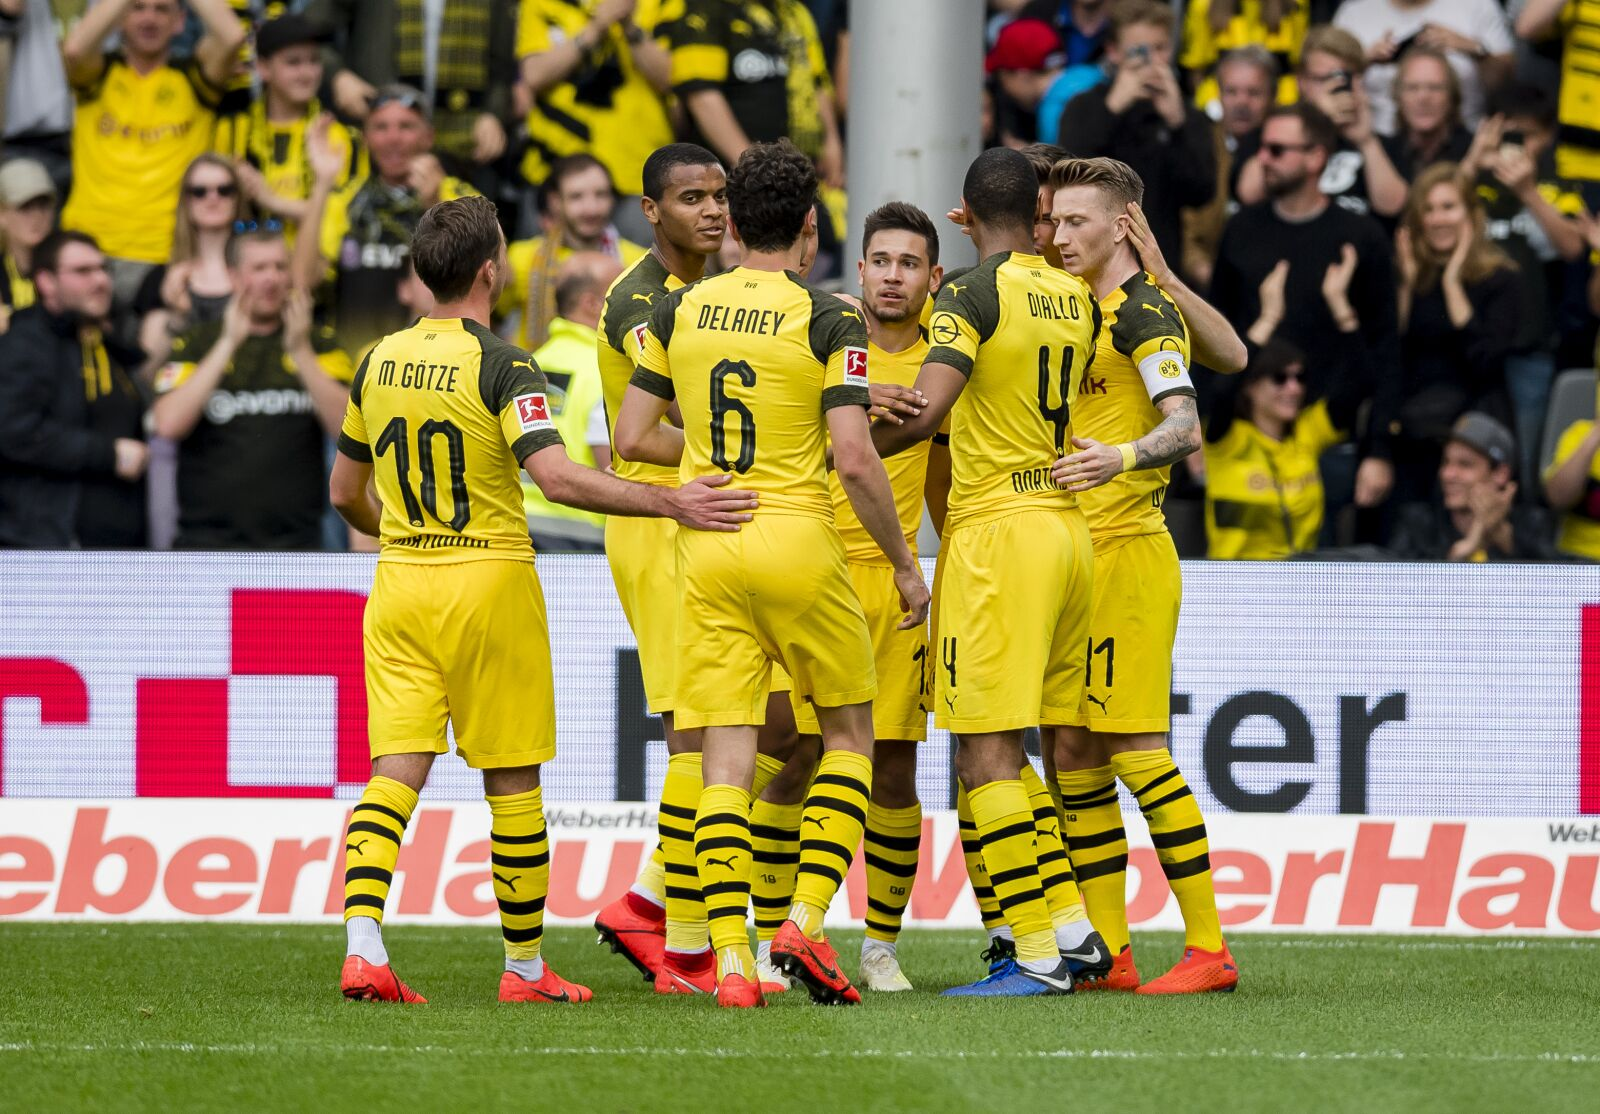 Bundesliga Roundup: Borussia Dortmund cruise past Freiburg to keep pressure on Bayern